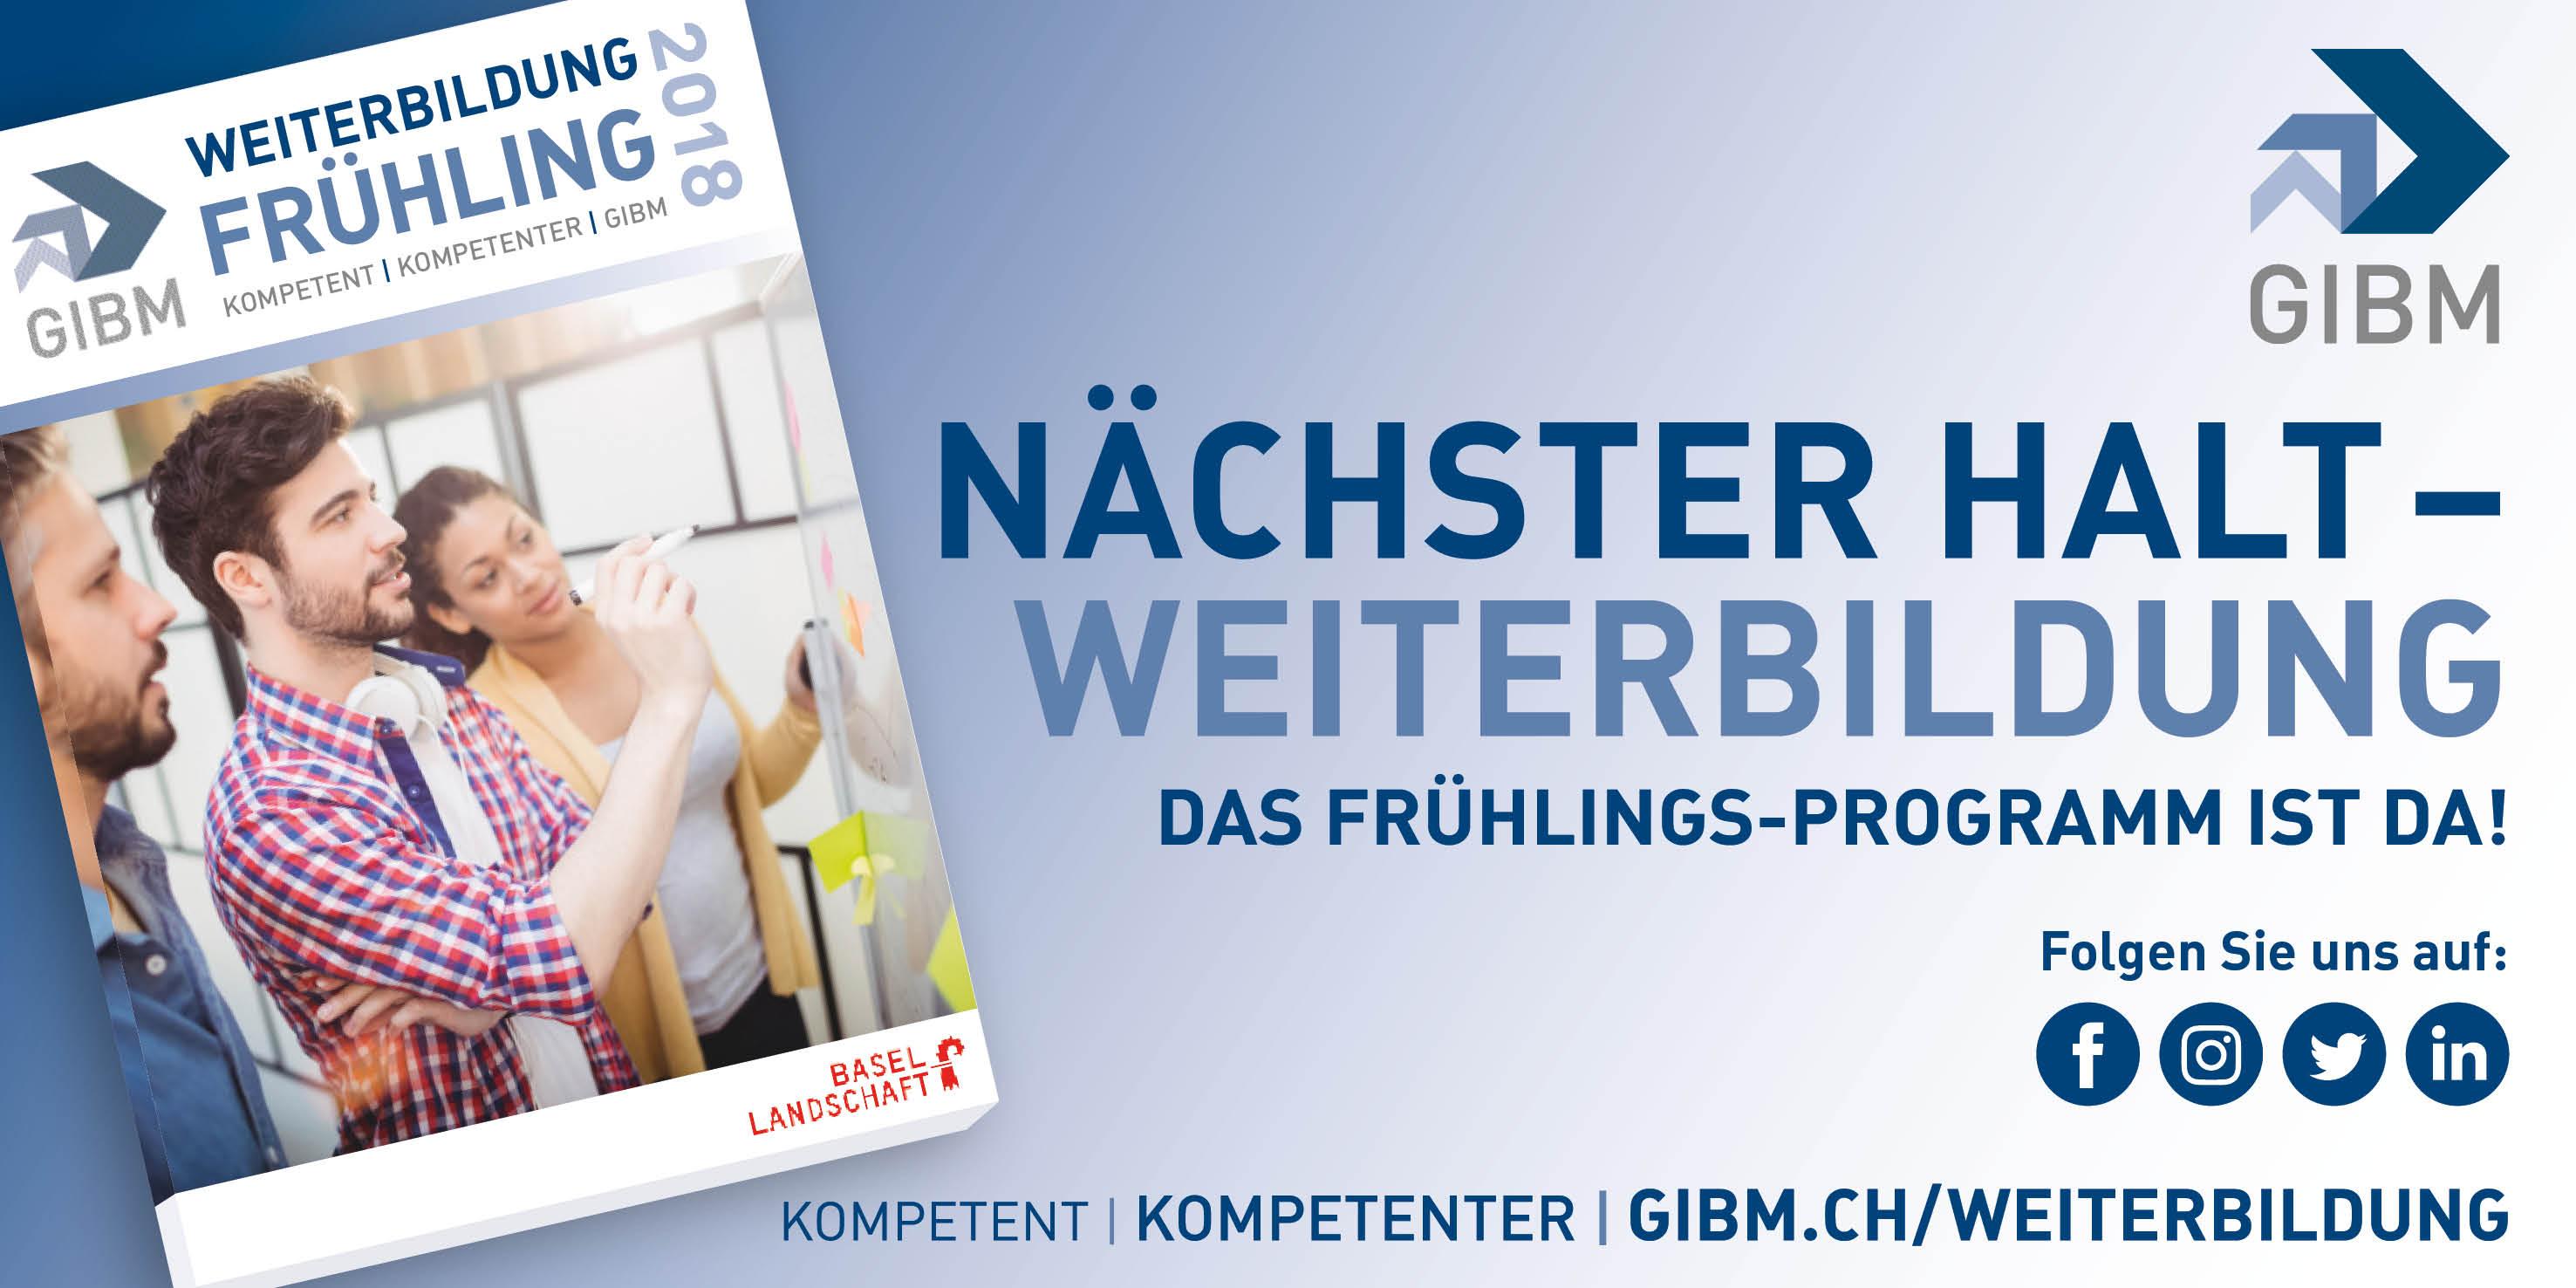 RZ_GIBM_Fenstertransparent_500x250mm_111